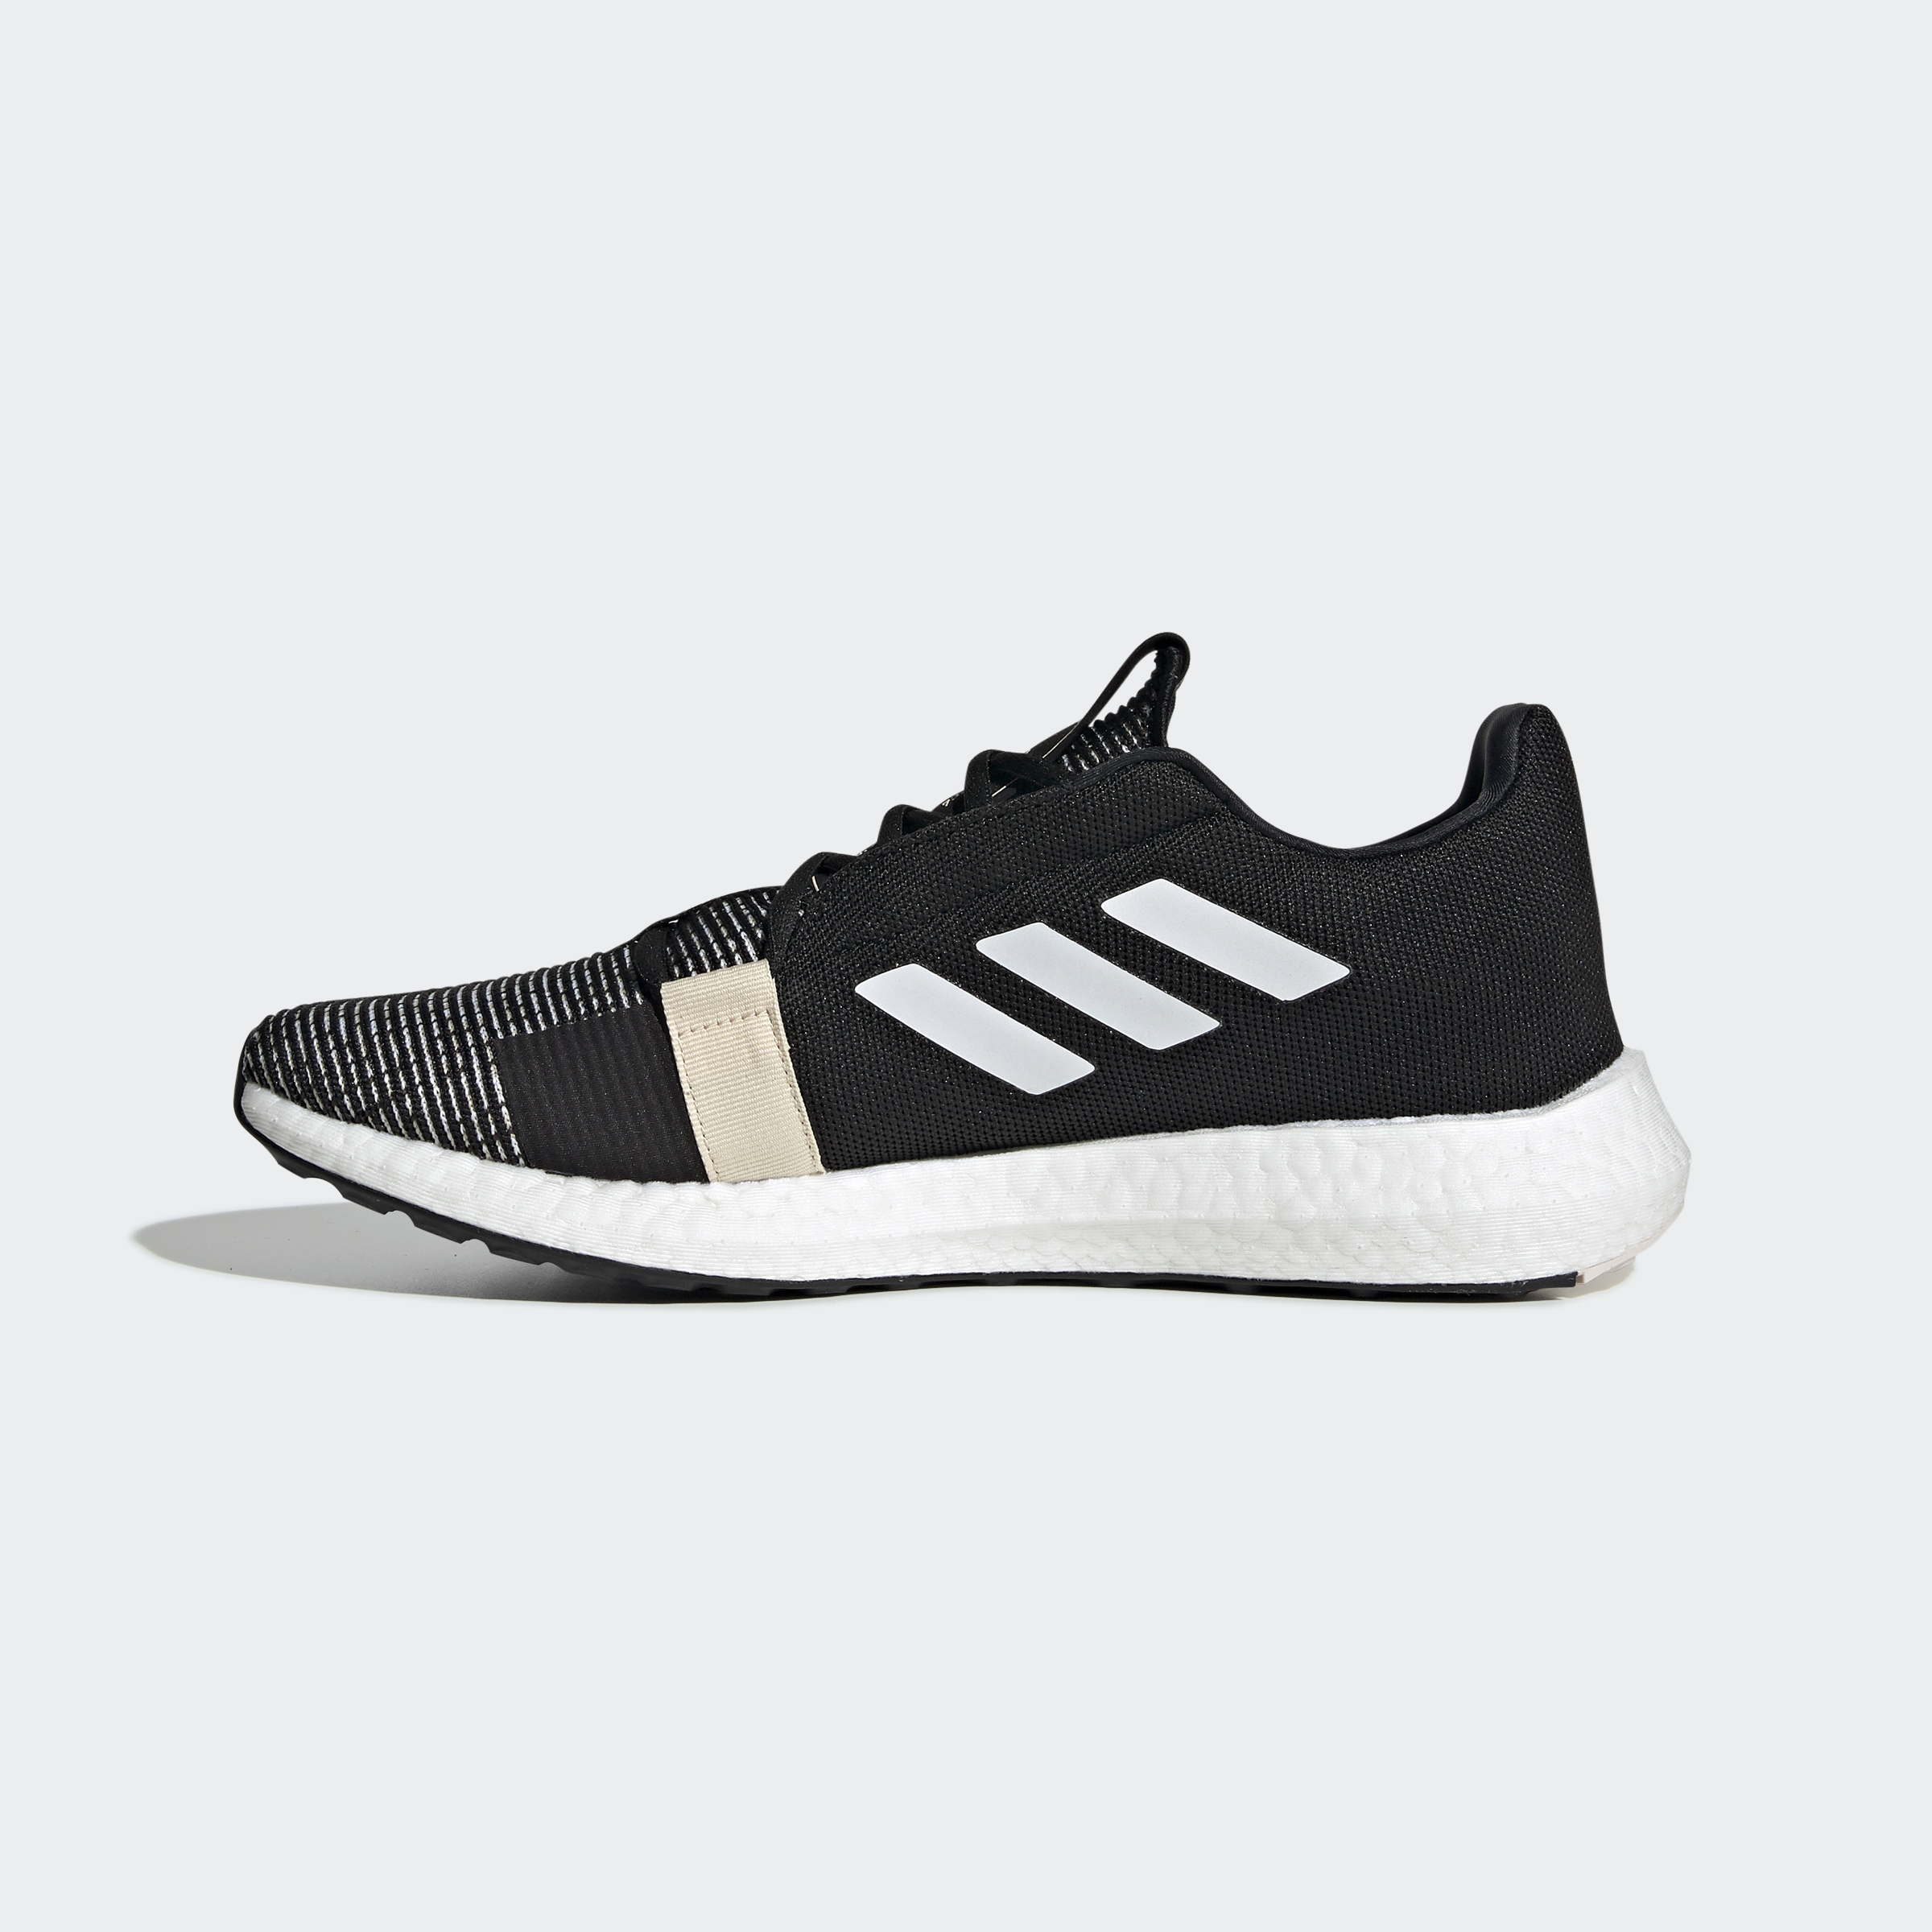 miniature 45 - adidas Senseboost Go Shoes Men's Athletic & Sneakers